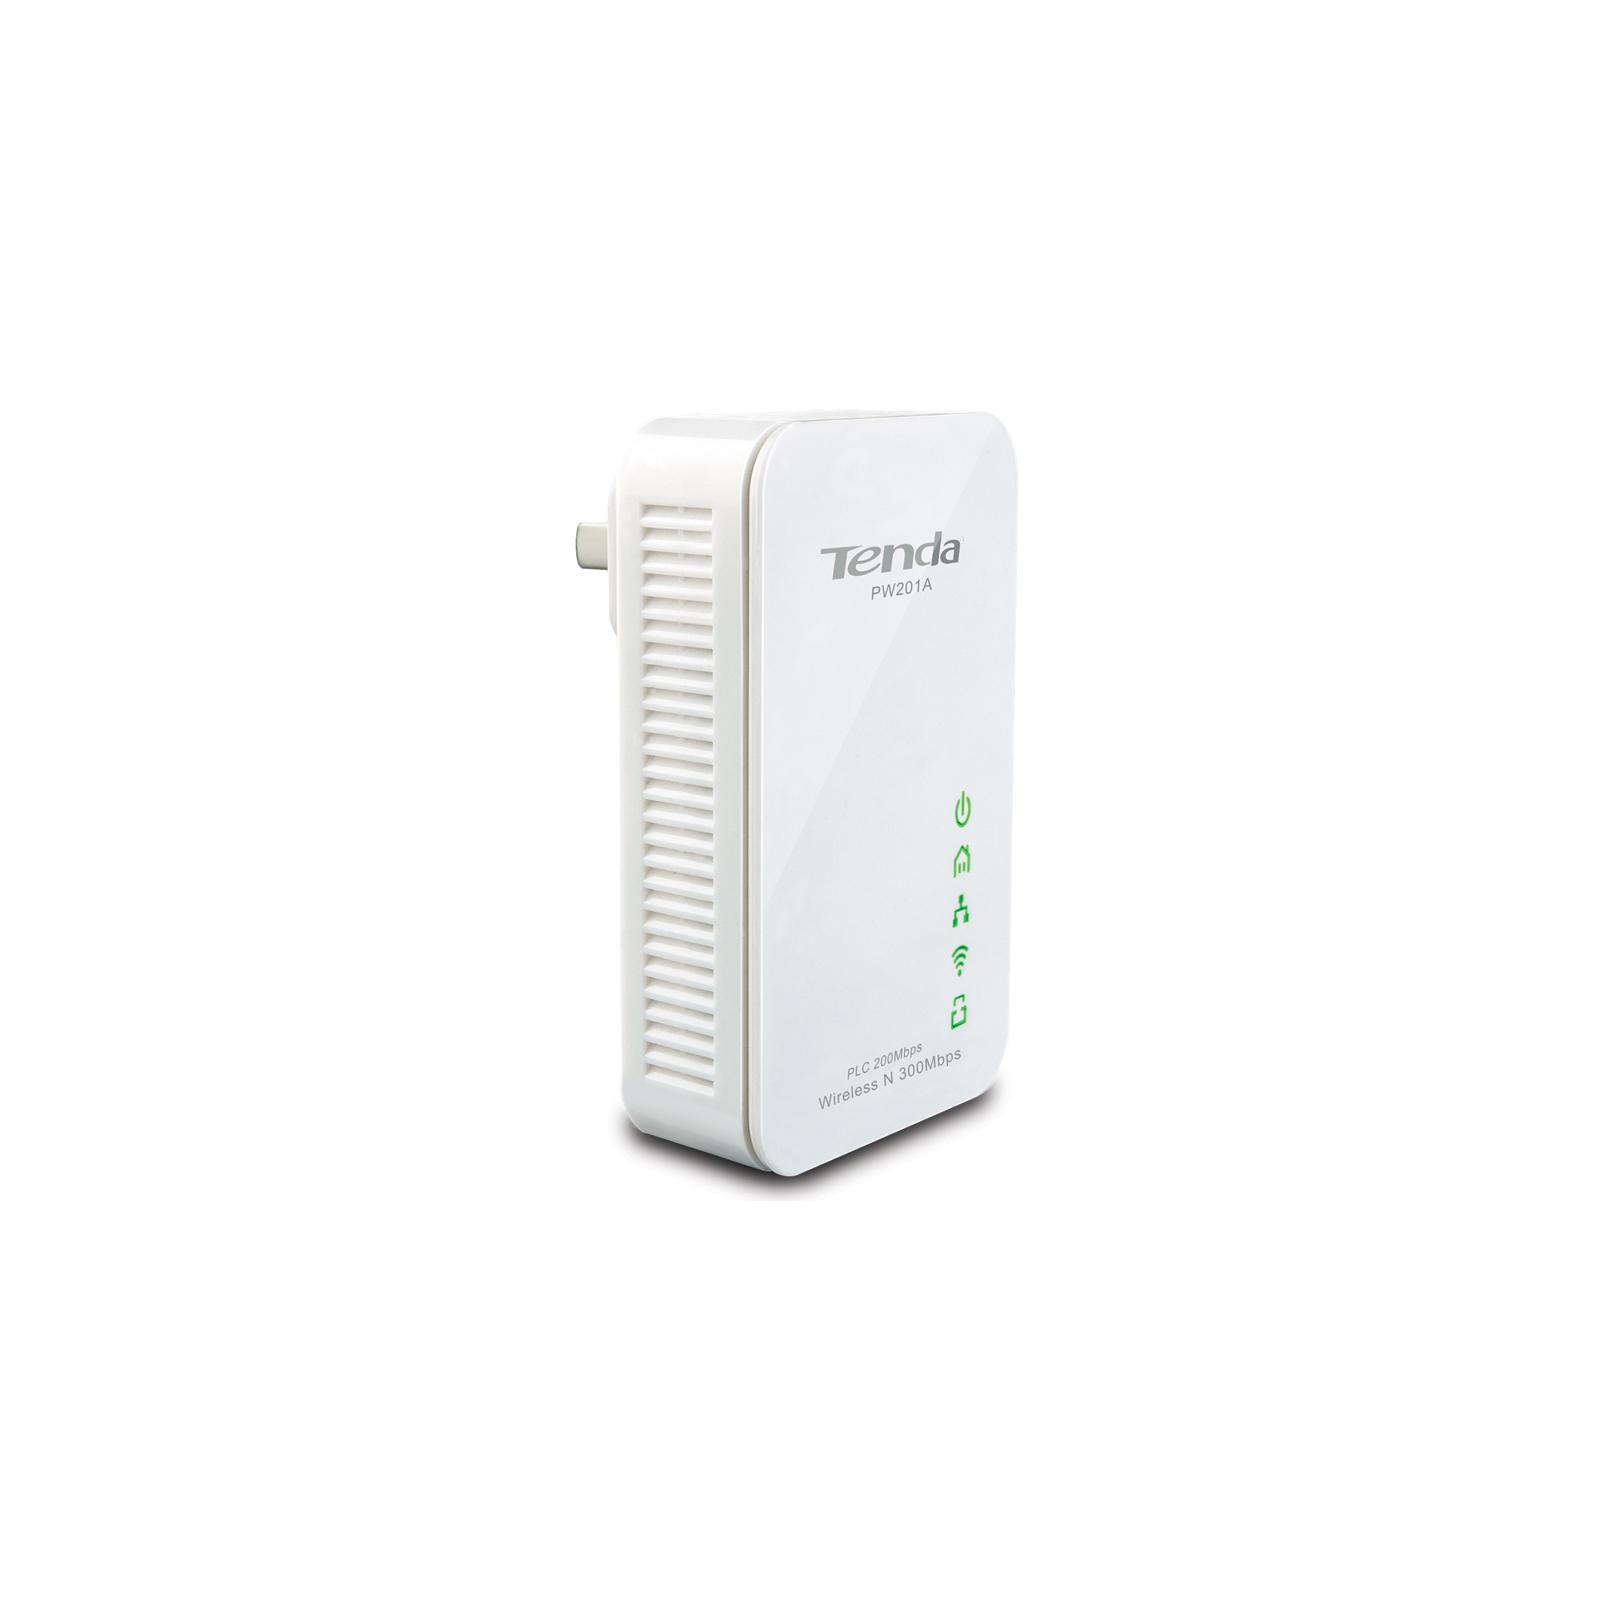 Адаптер Powerline TENDA PW201A-P200-KIT изображение 5